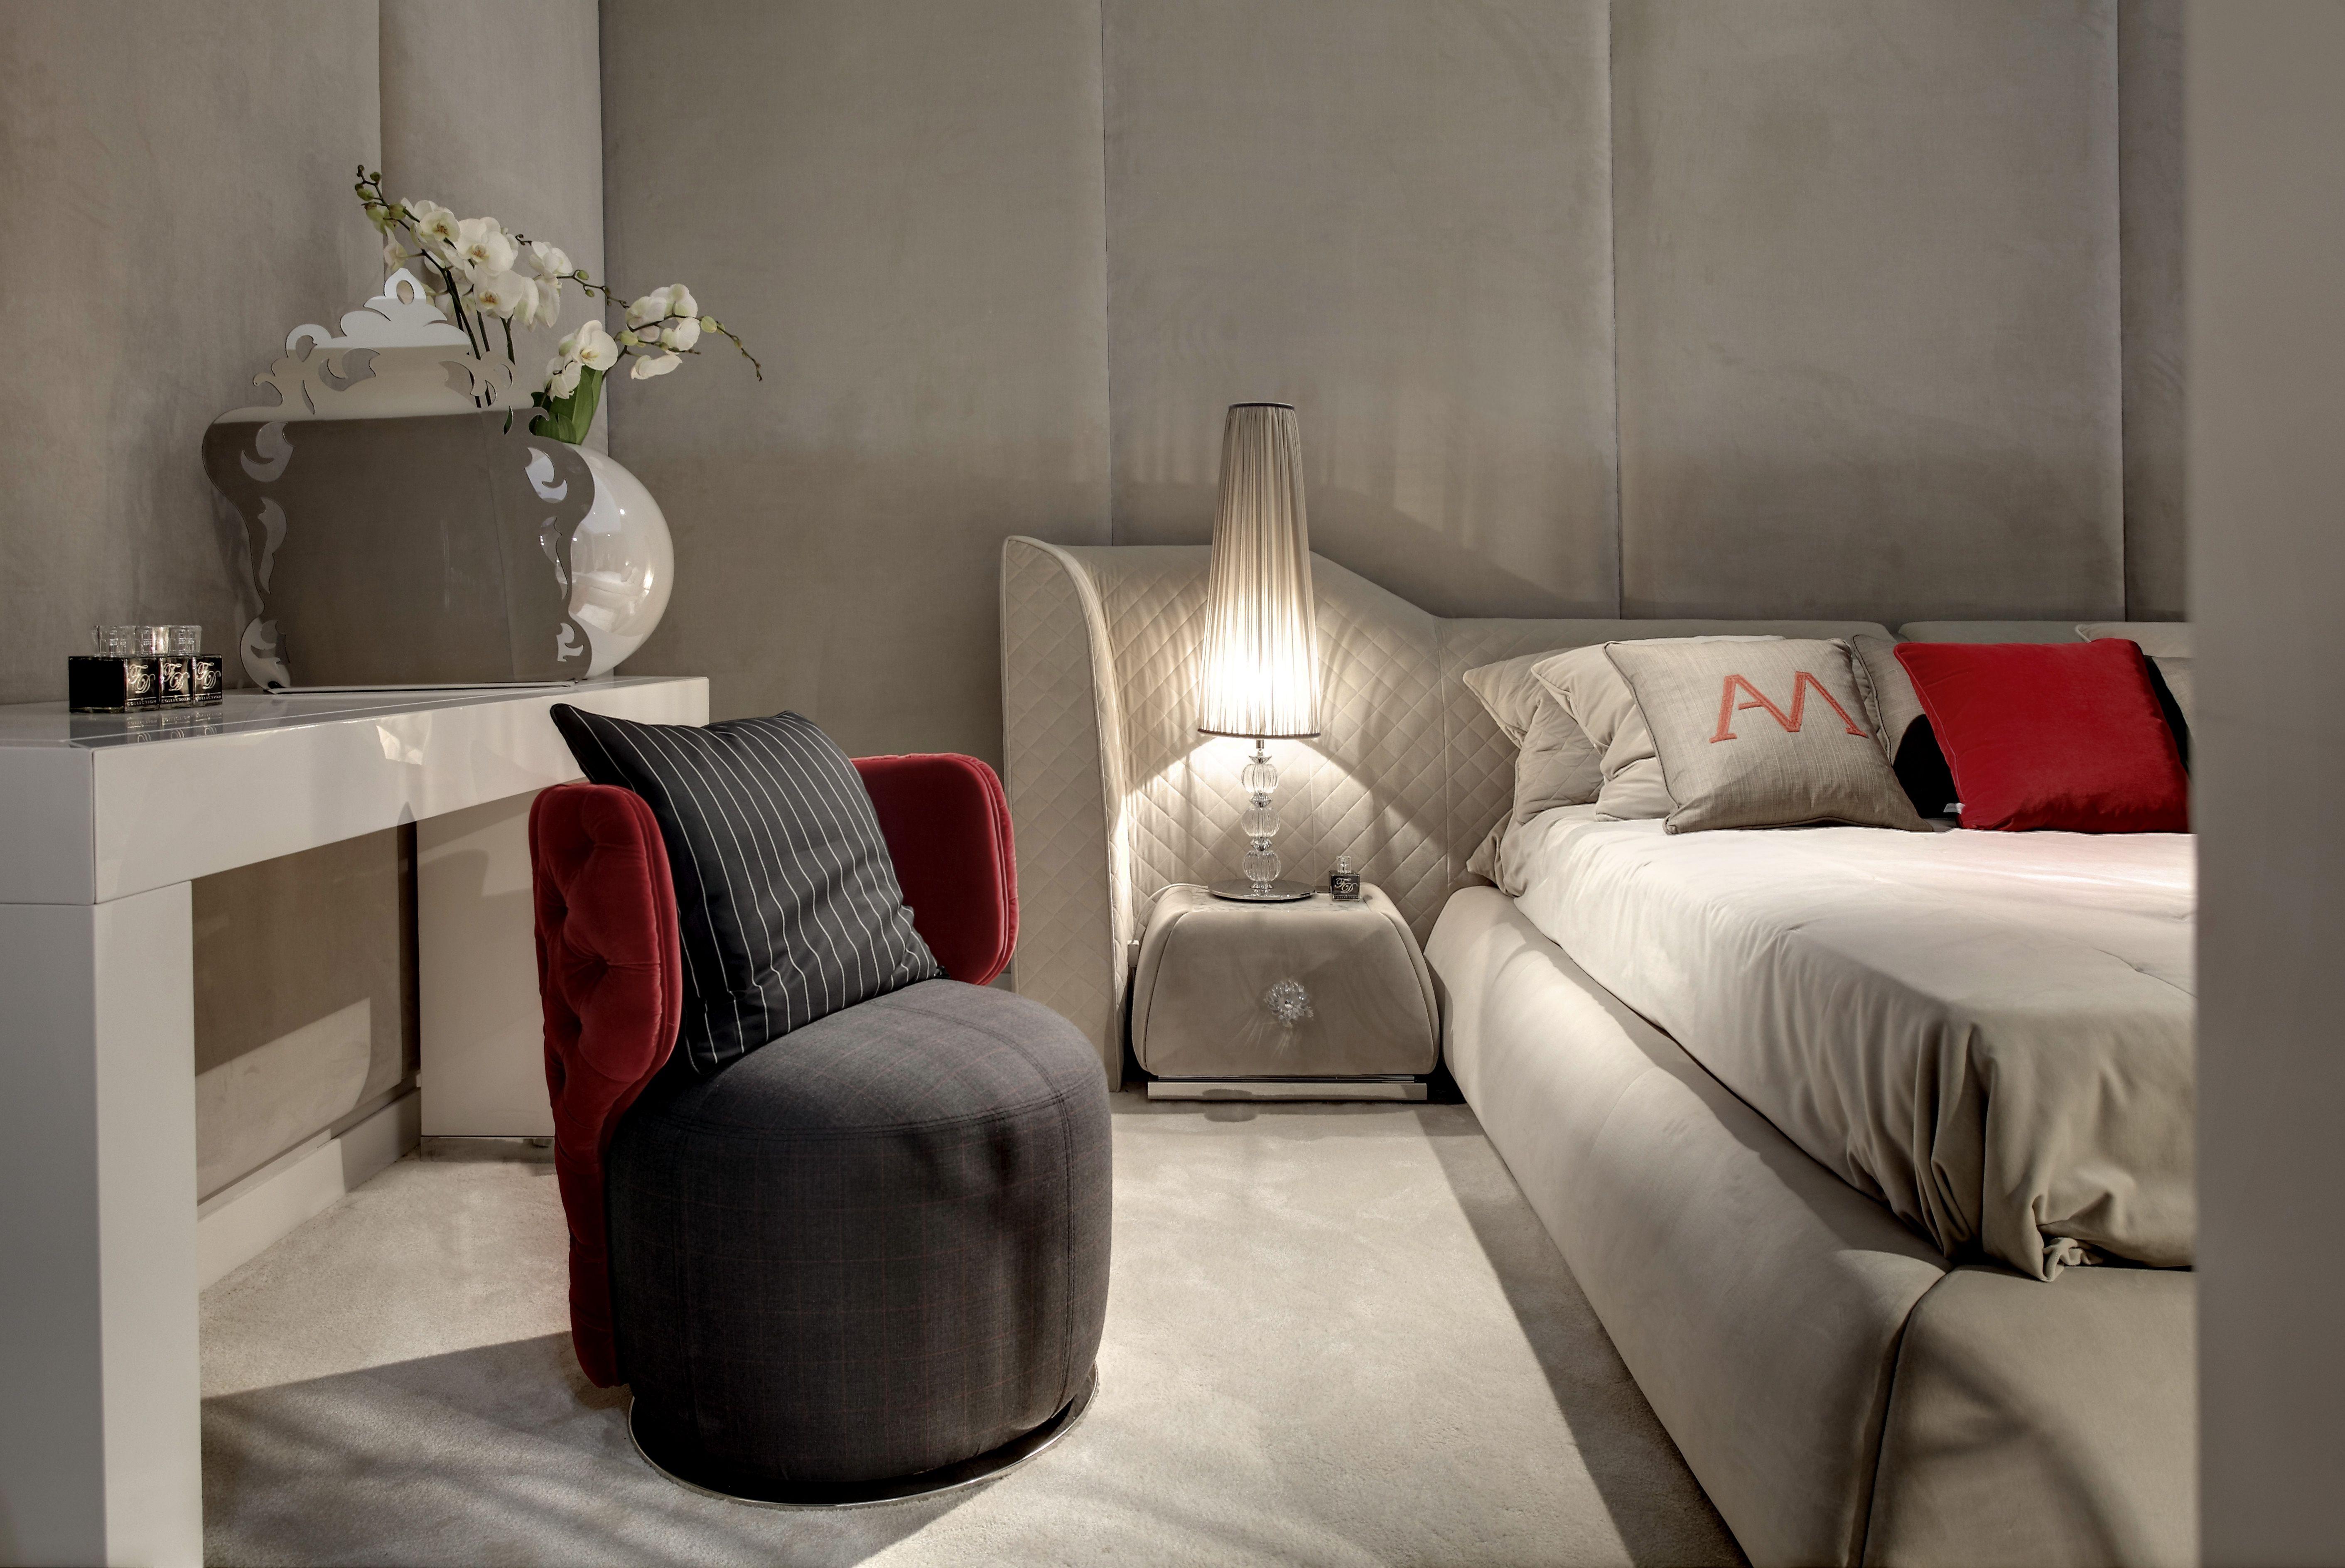 AmCasa by Dolfi designed by andrea bonini